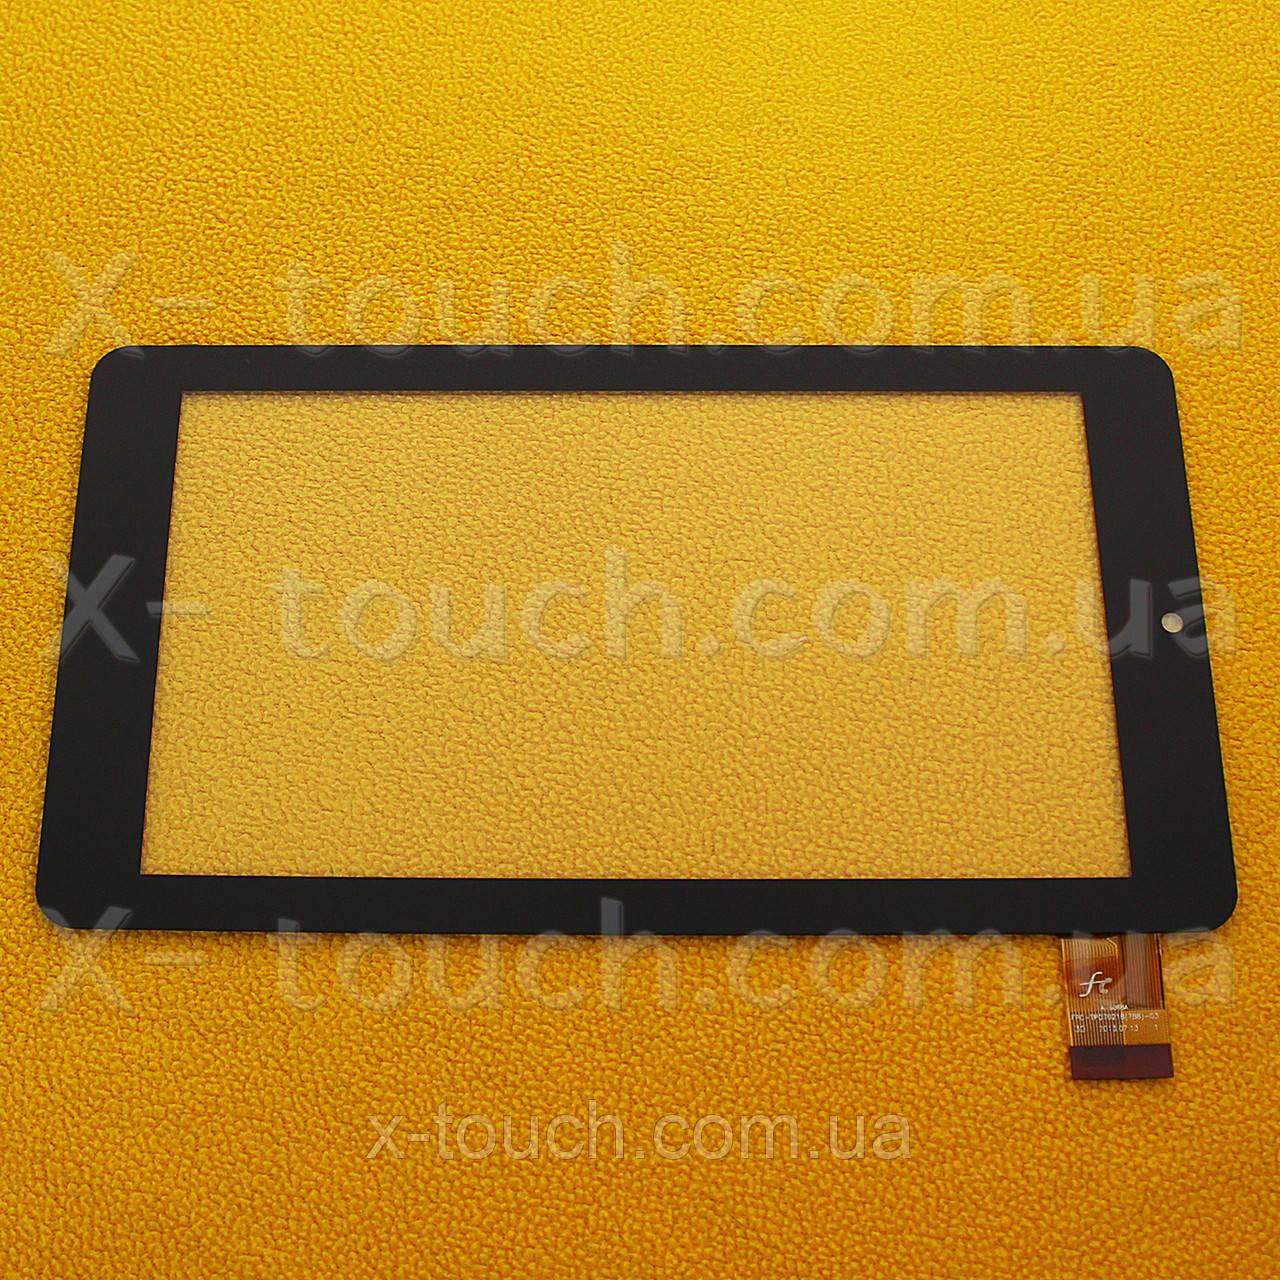 Тачскрин, сенсор  FPC-TP070218(788)-03  для планшета